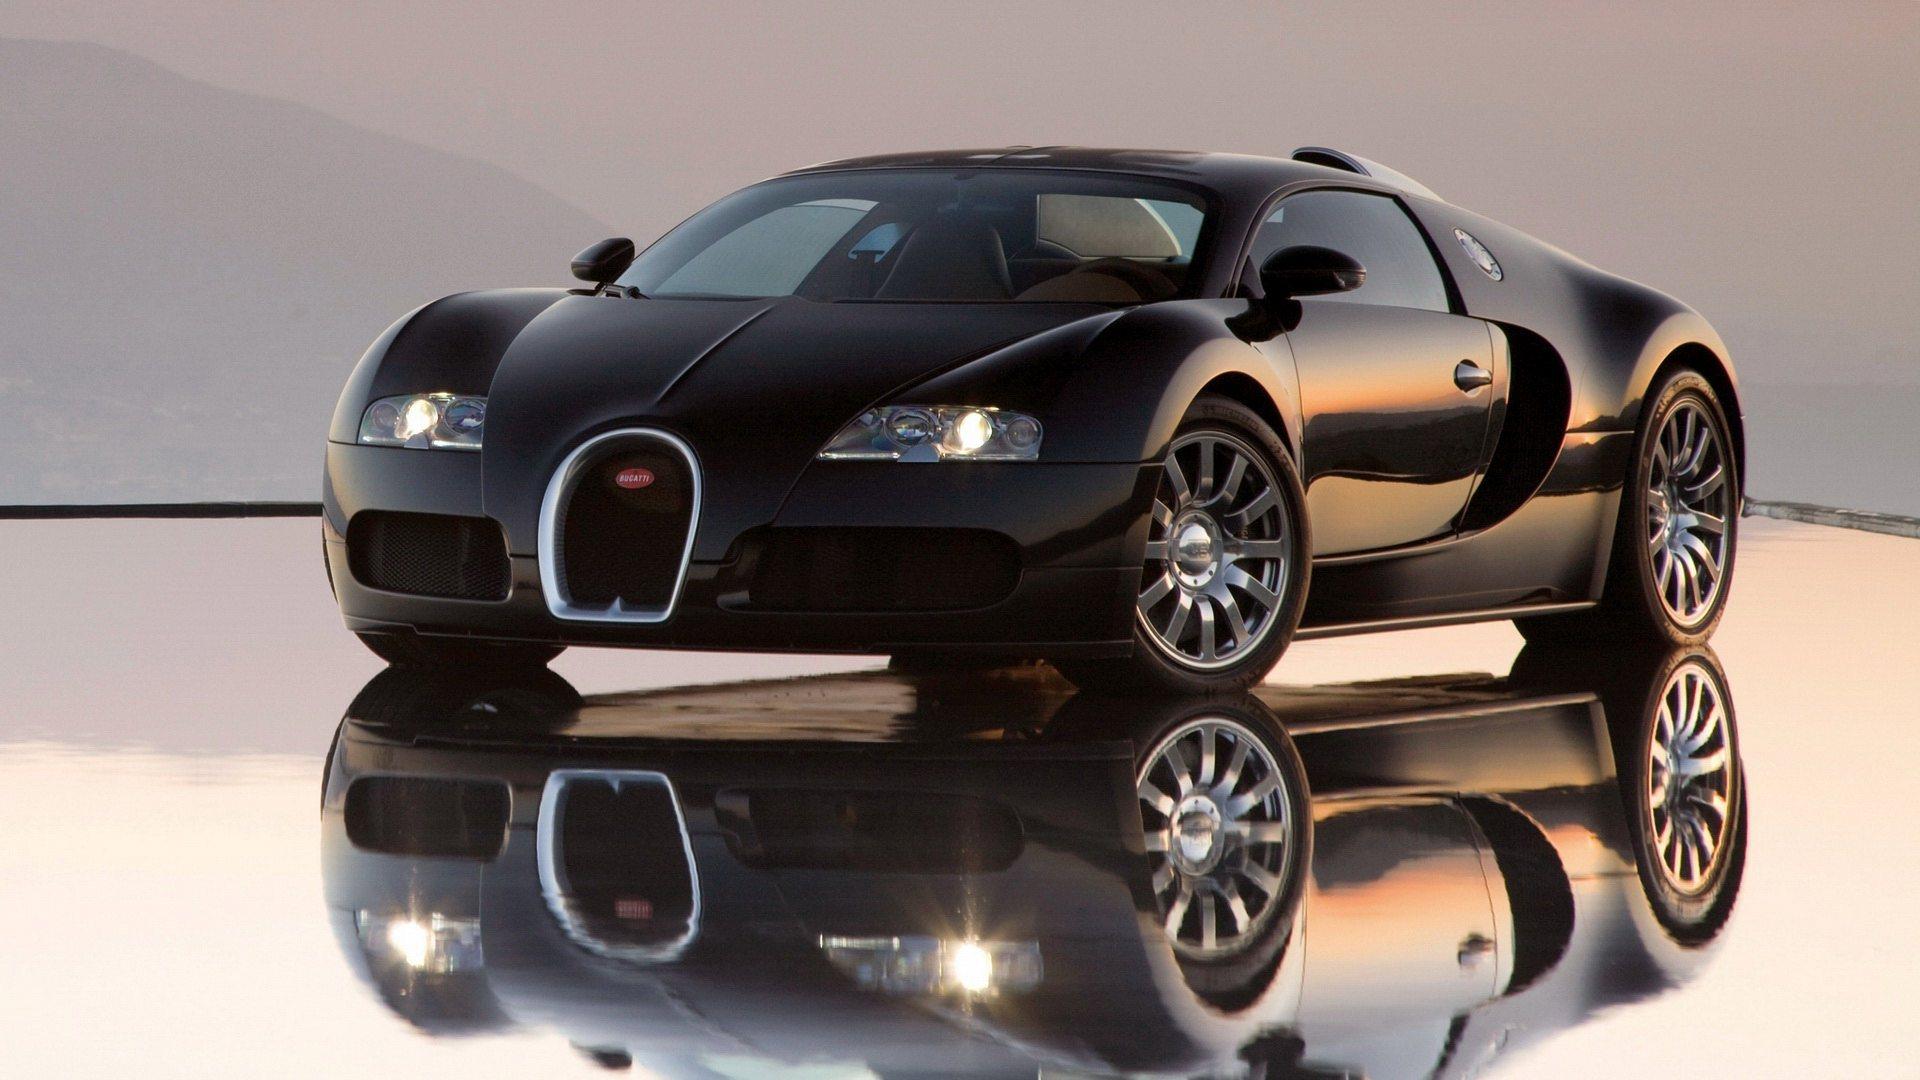 Black Bugatti Veyron For Desktop 1920x1080